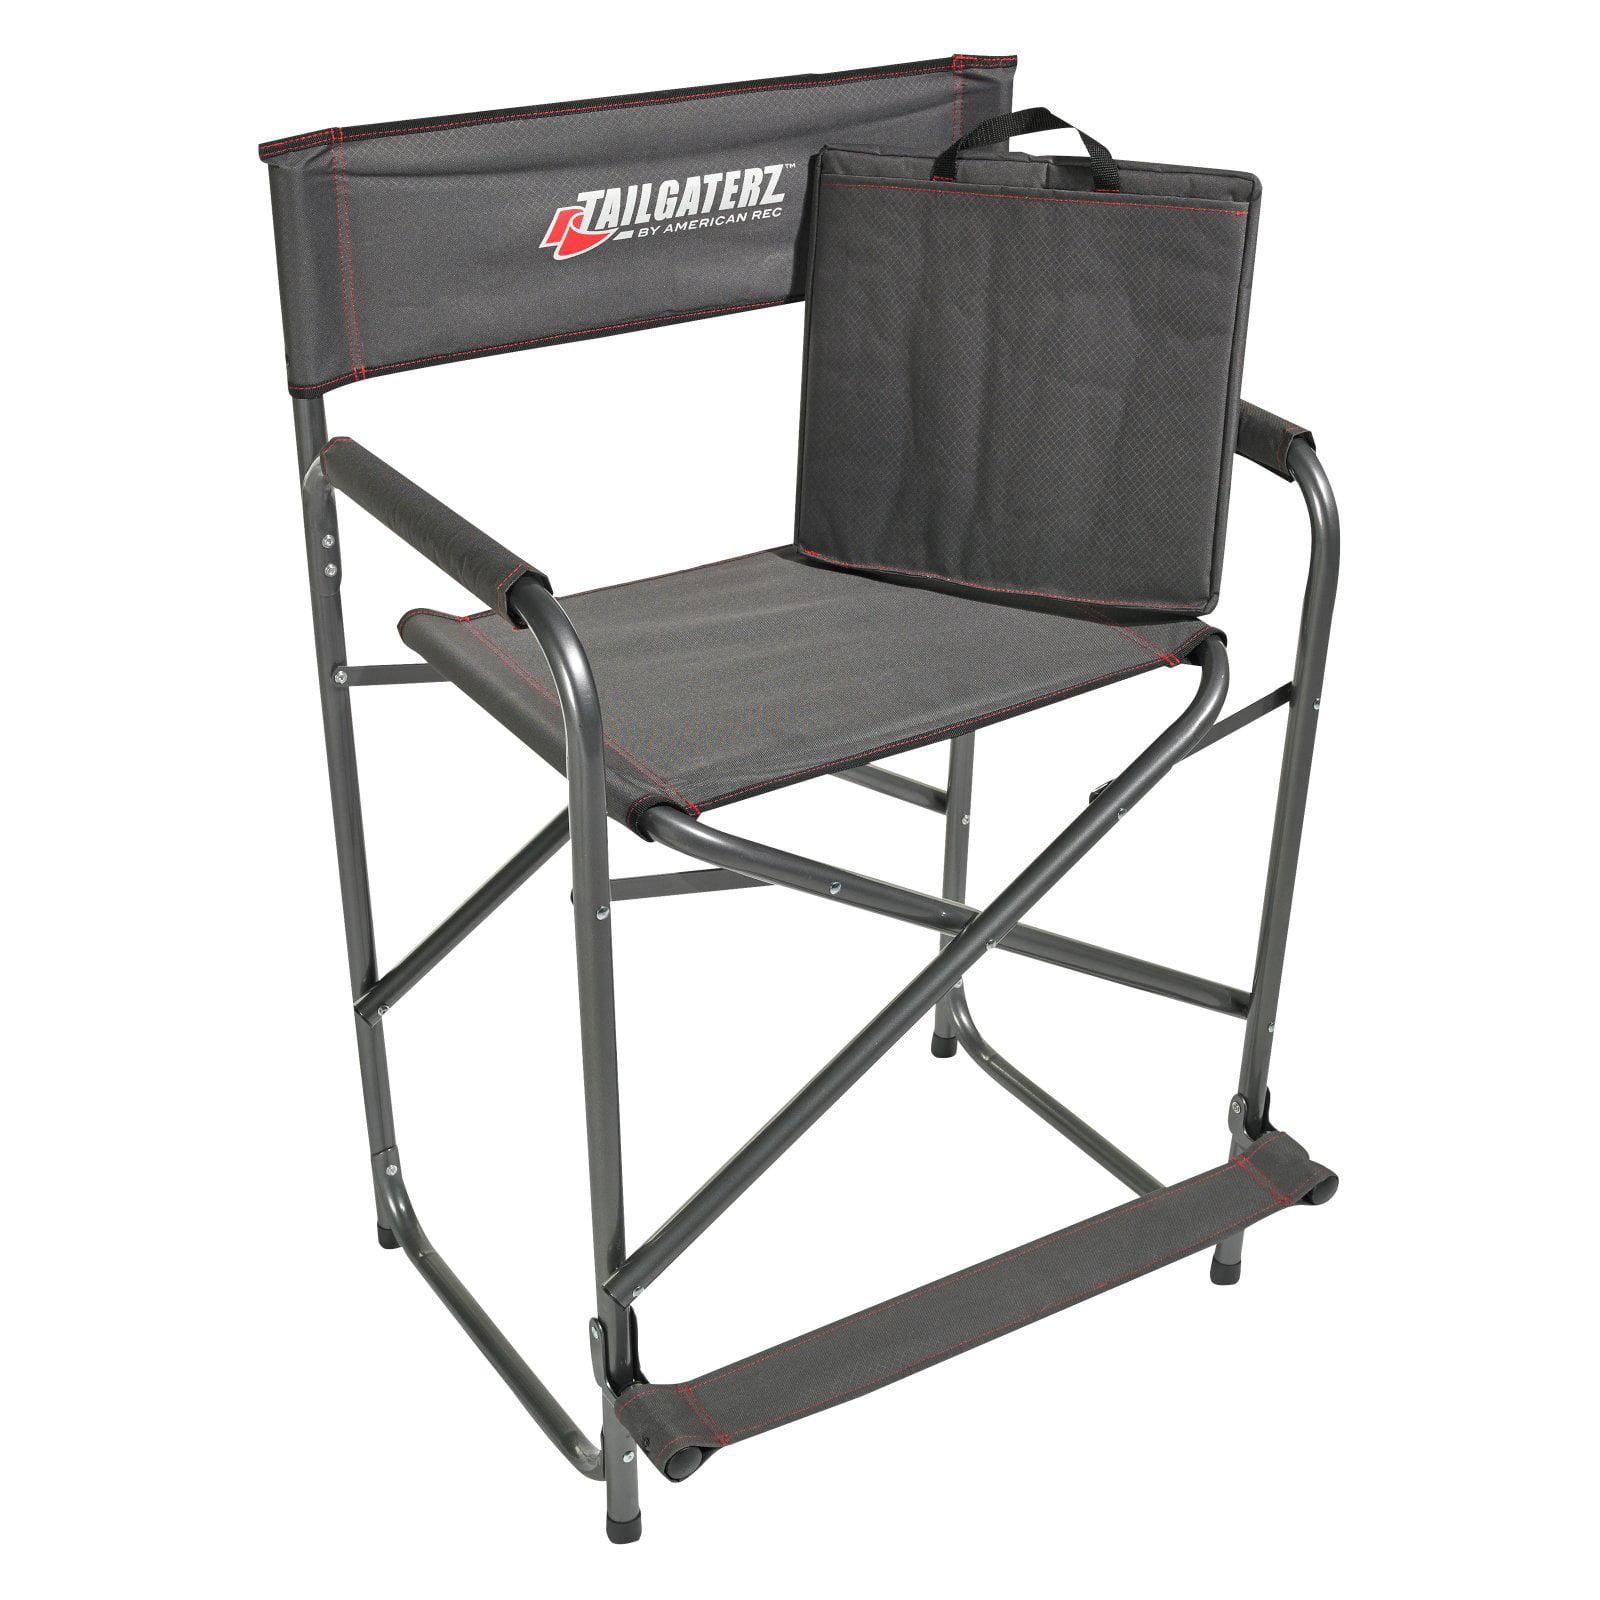 Tailgaterz Take-out Seat - Walmart.com